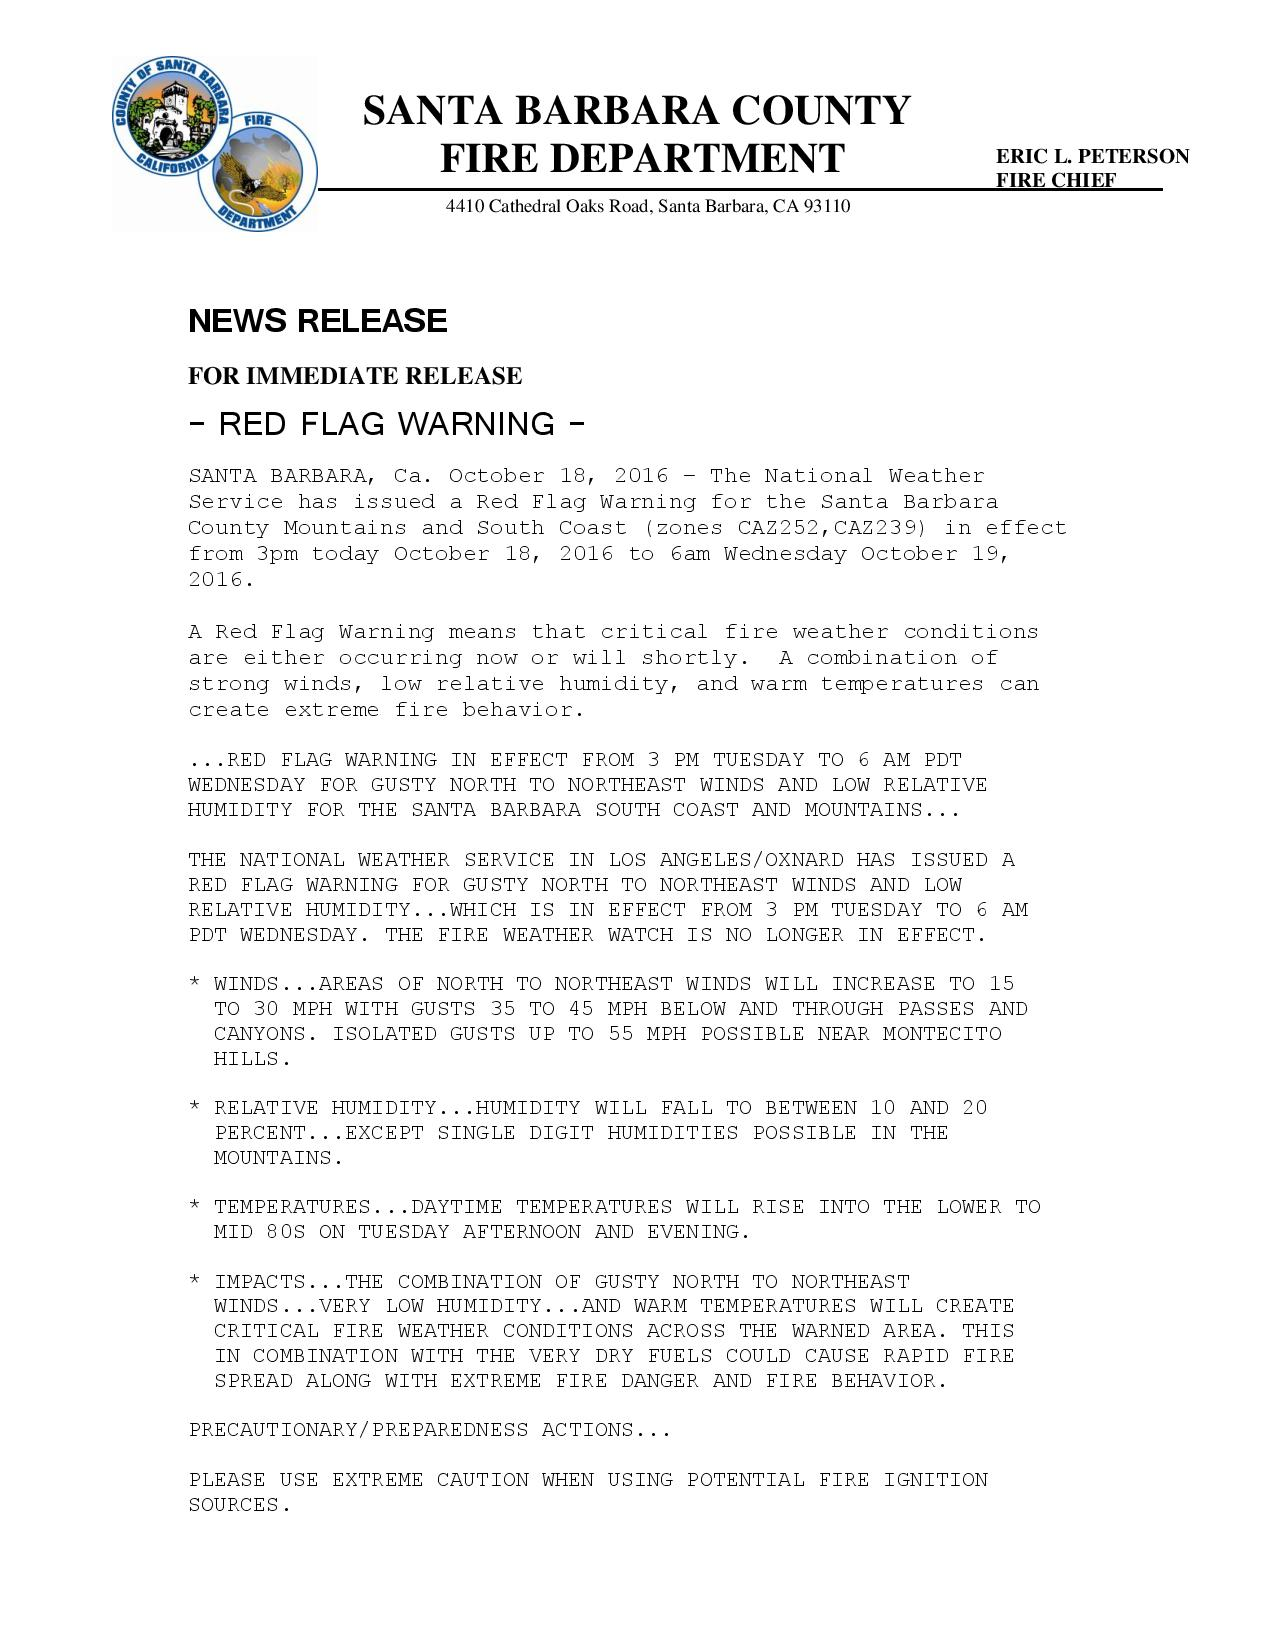 Red Flag Warning-pg1